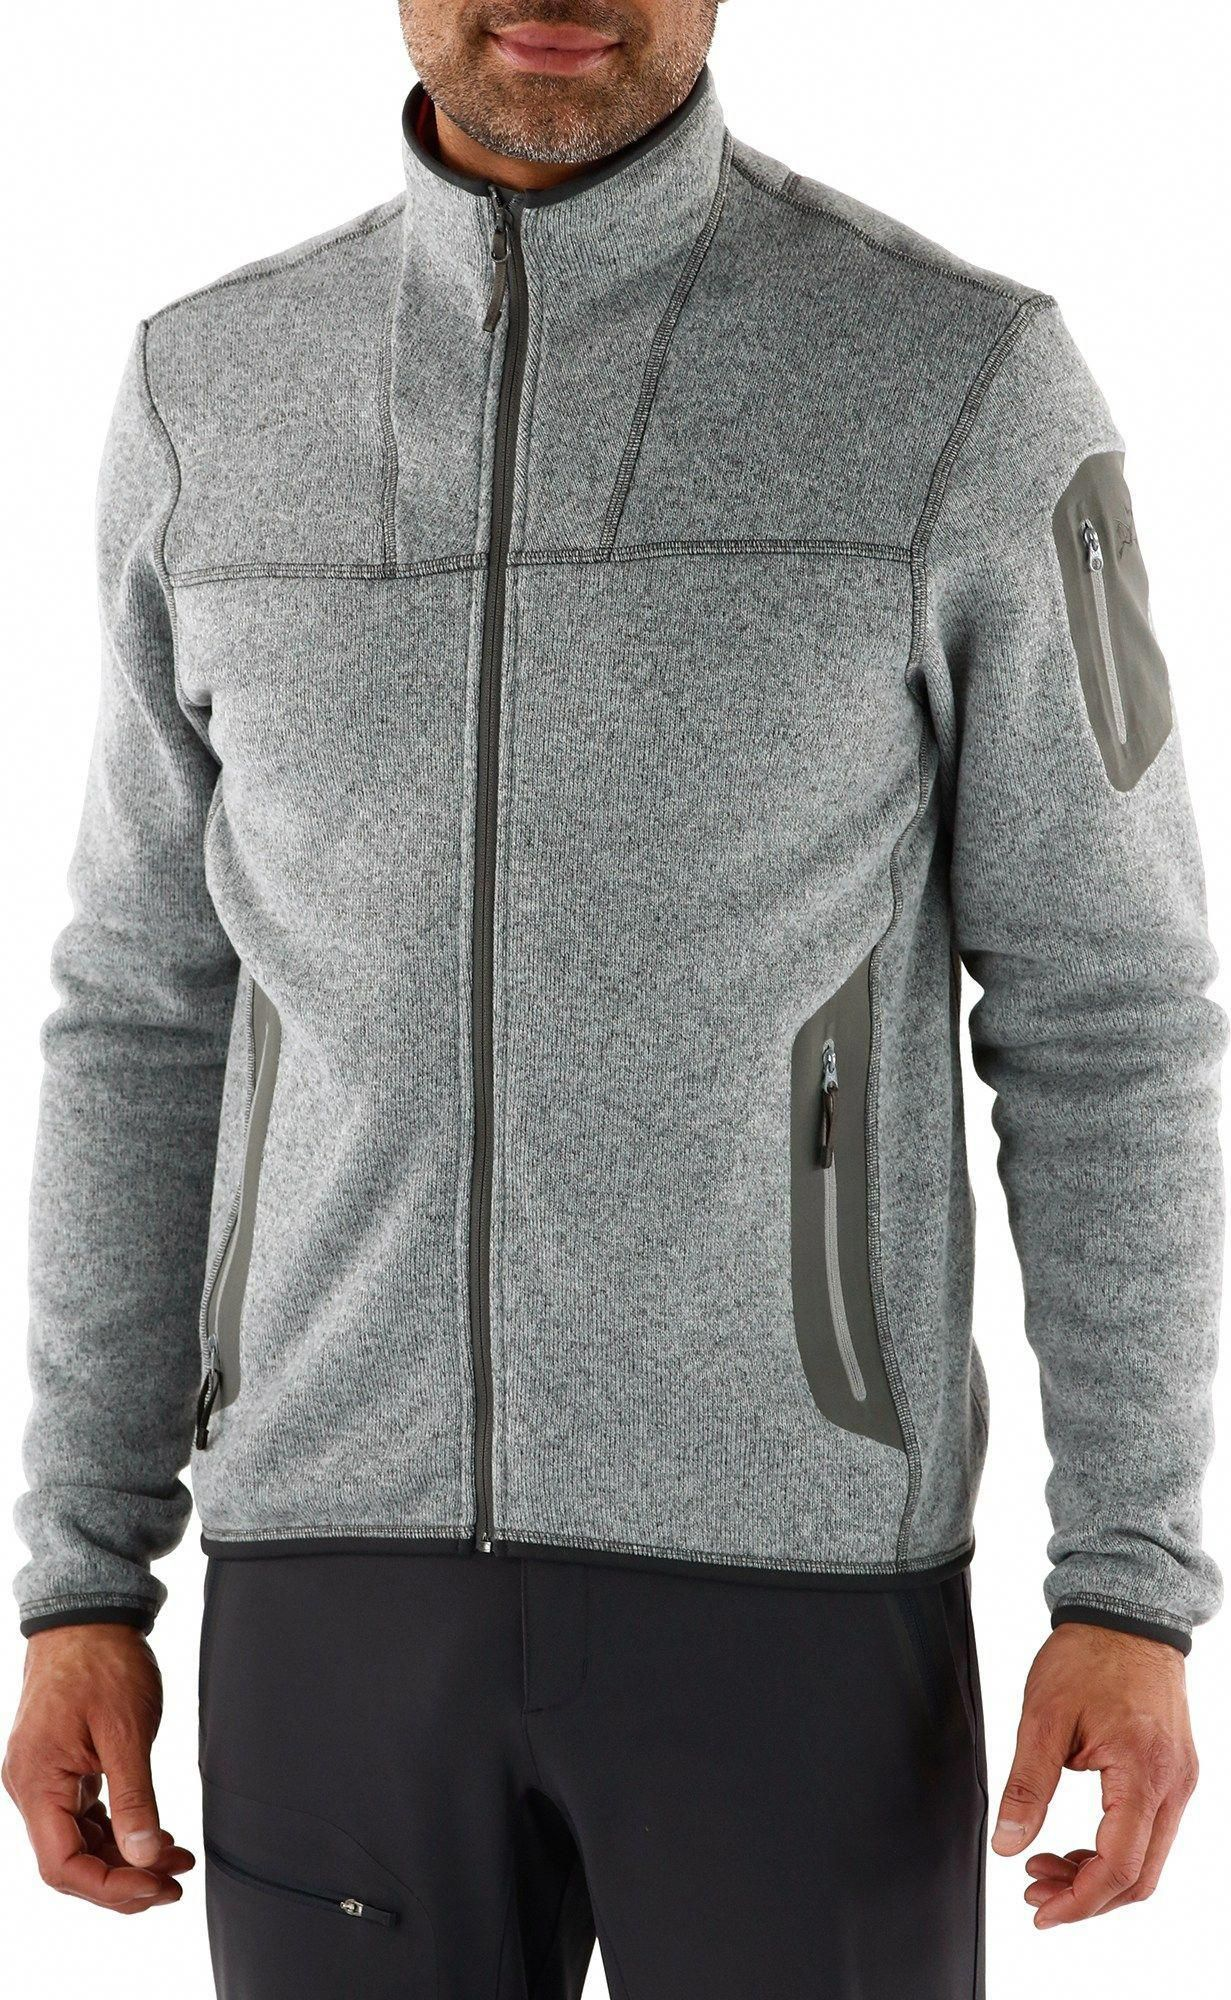 cb59624021dd Arc'teryx Male Covert Cardigan Fleece Jacket - Men's  #leatherjacketsformenblue